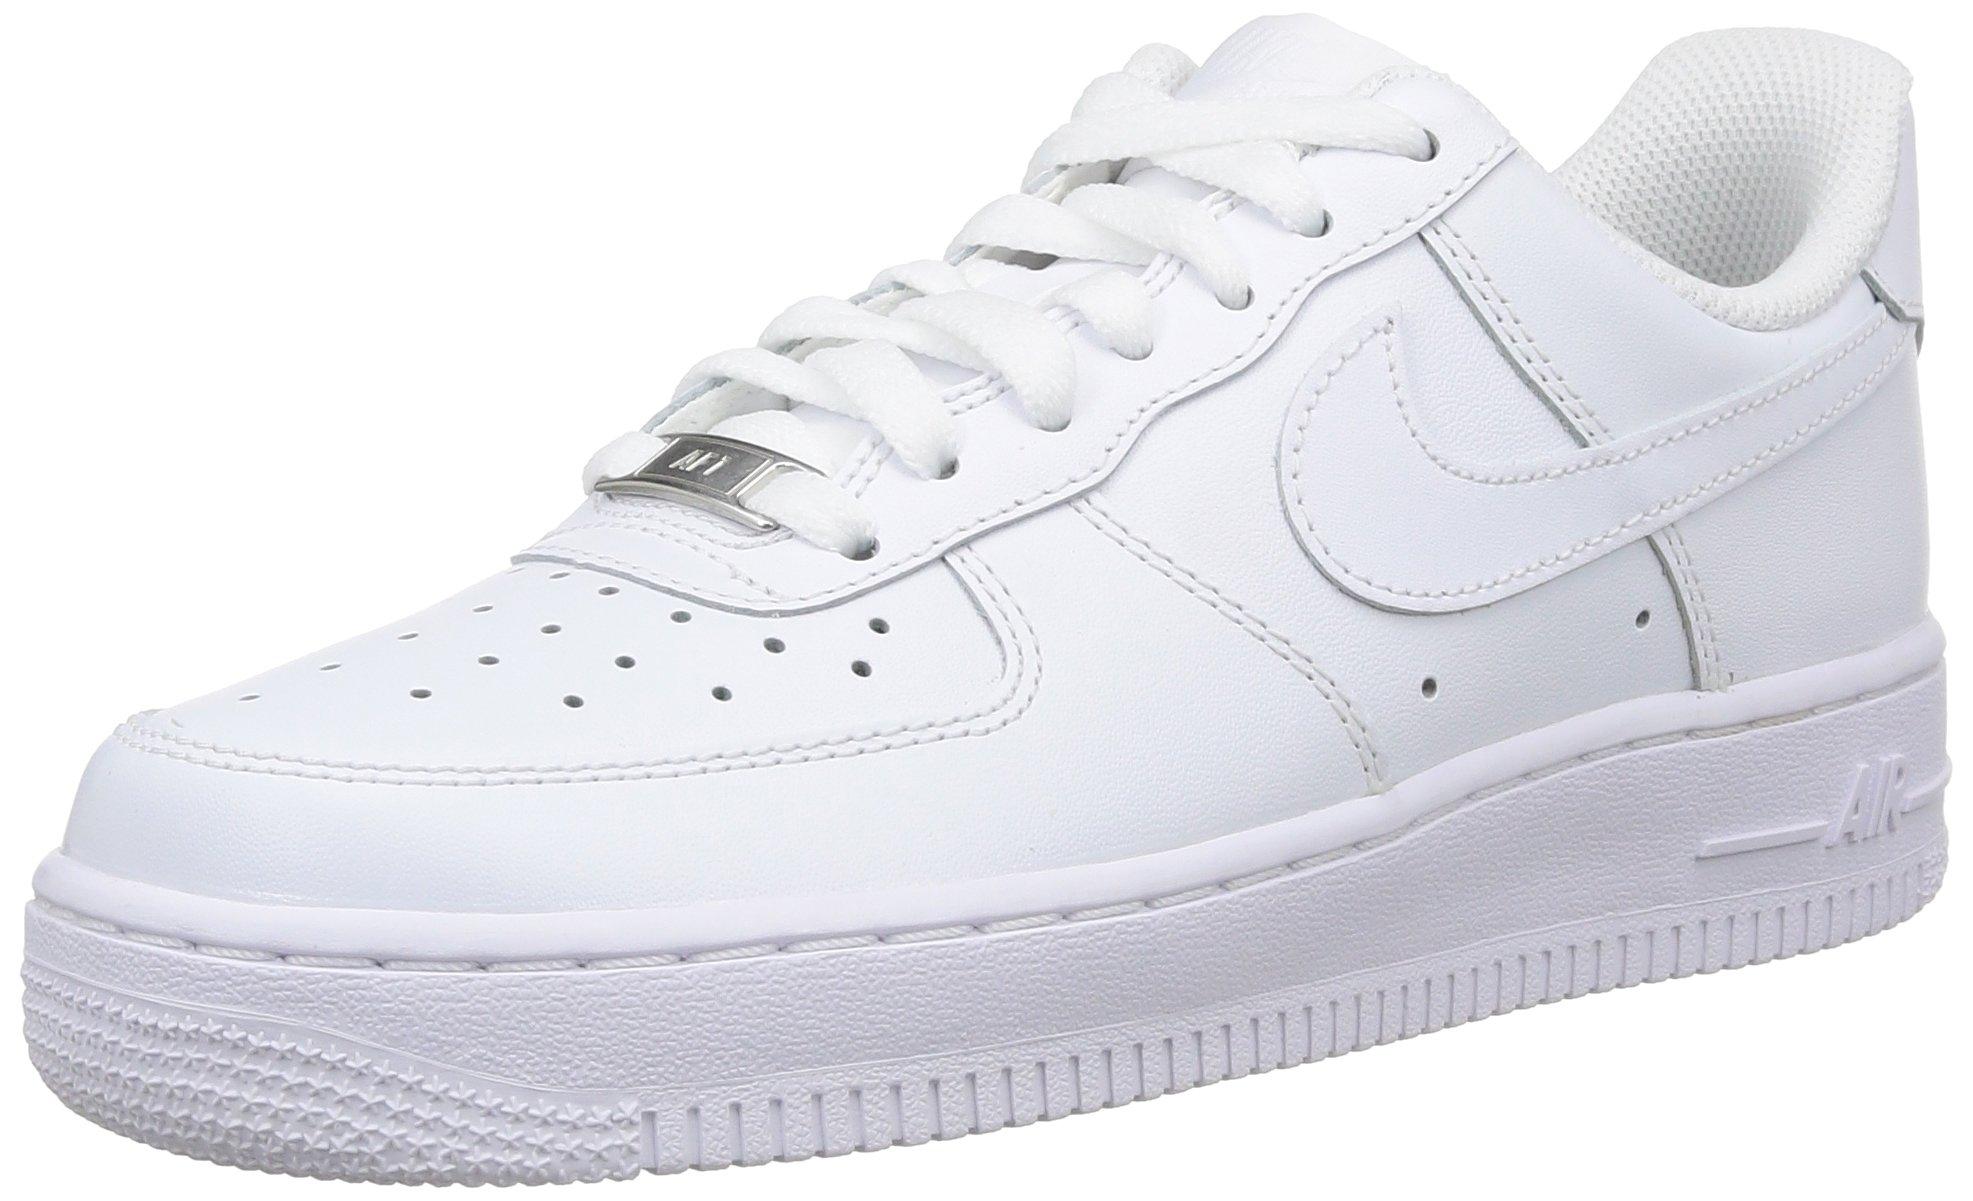 promo code 047d2 b1110 Nike Air Force White Women